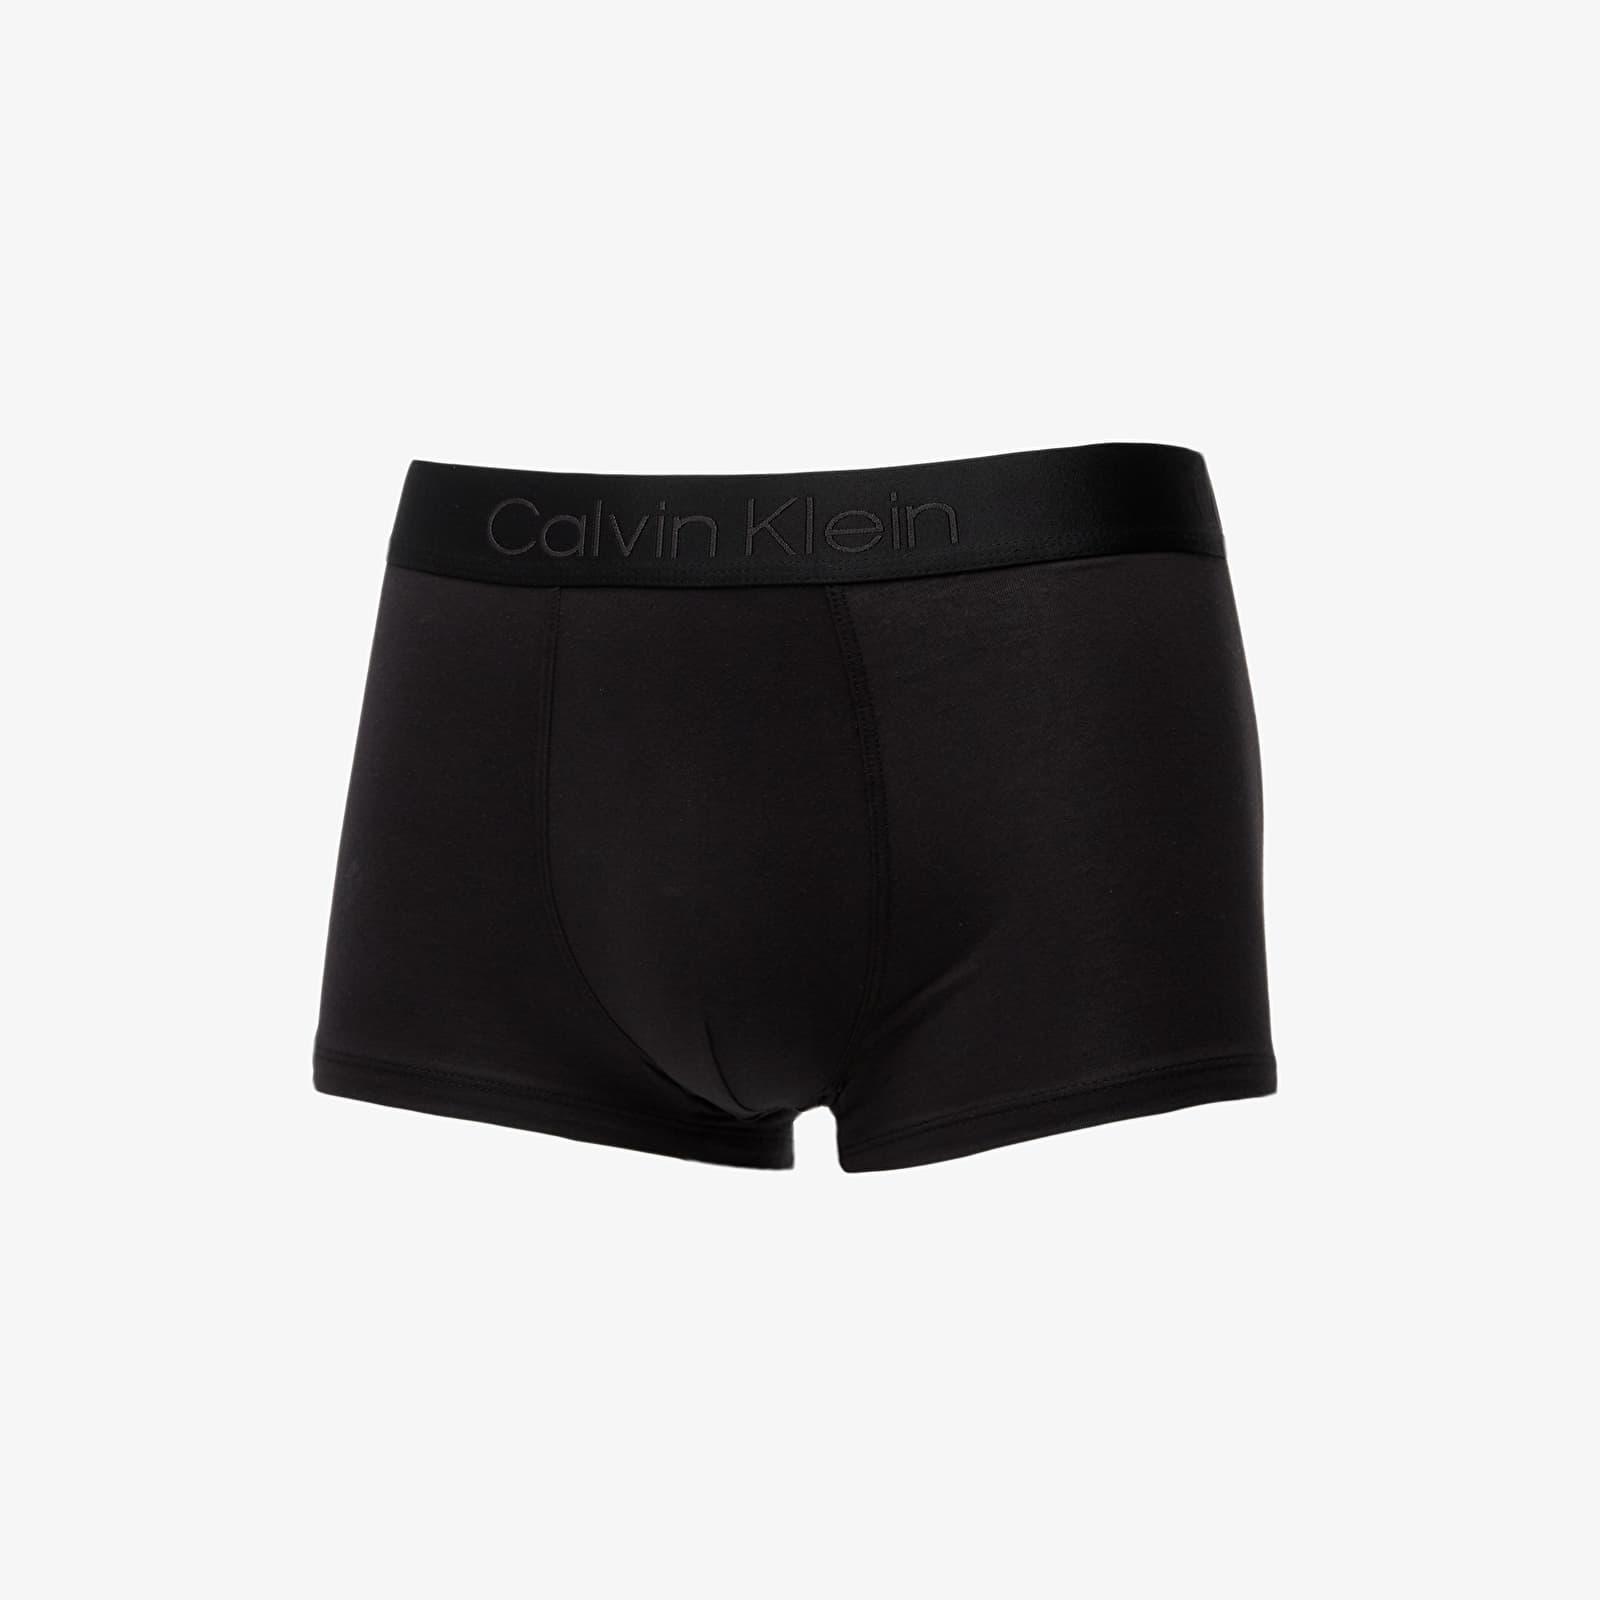 Boxershorts Calvin Klein Trunk Black